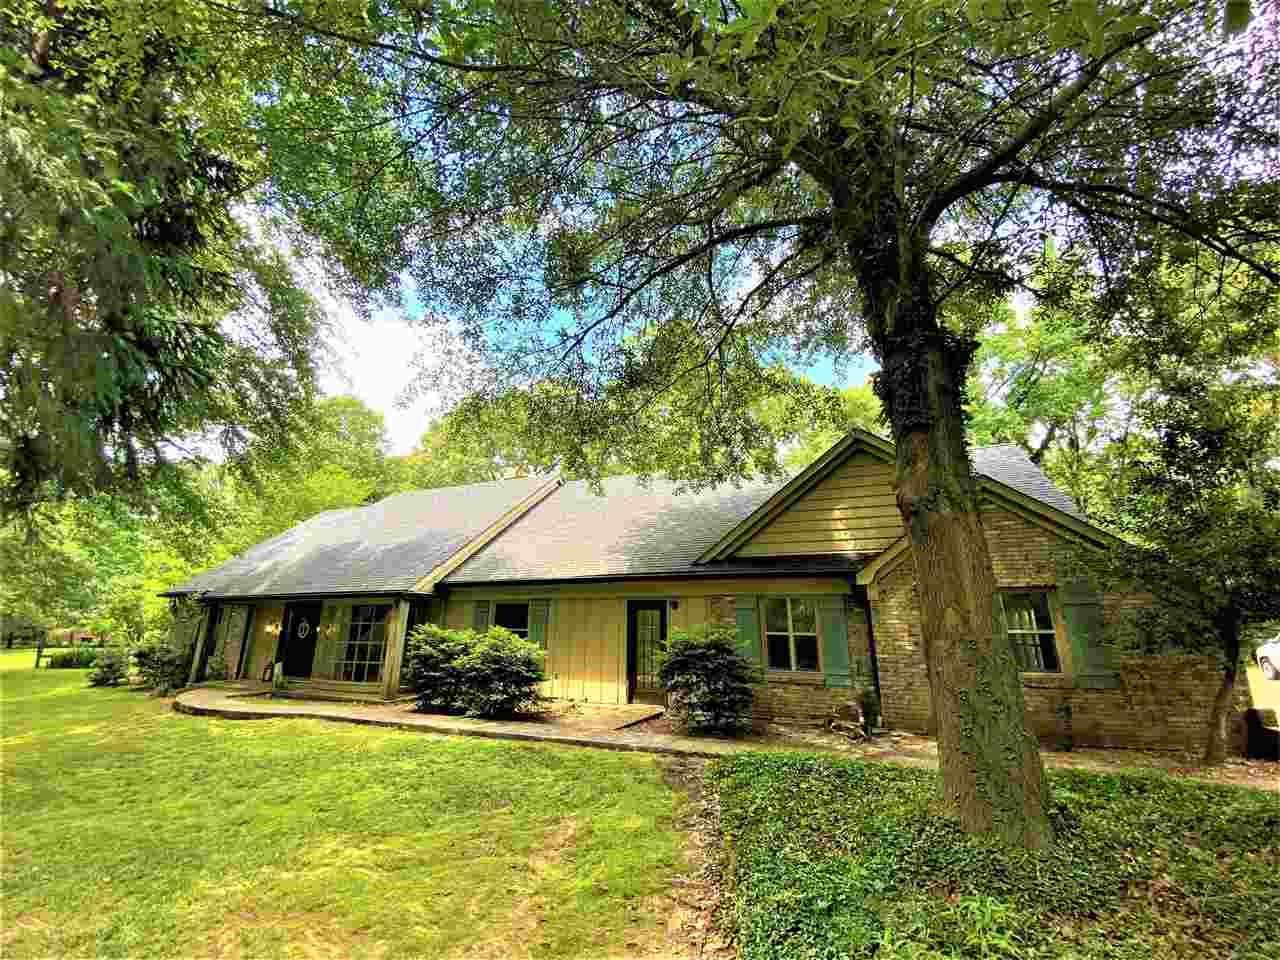 154 WILDWOOD TERRACE EXT, Yazoo City, MS 39194 - MLS#: 340928